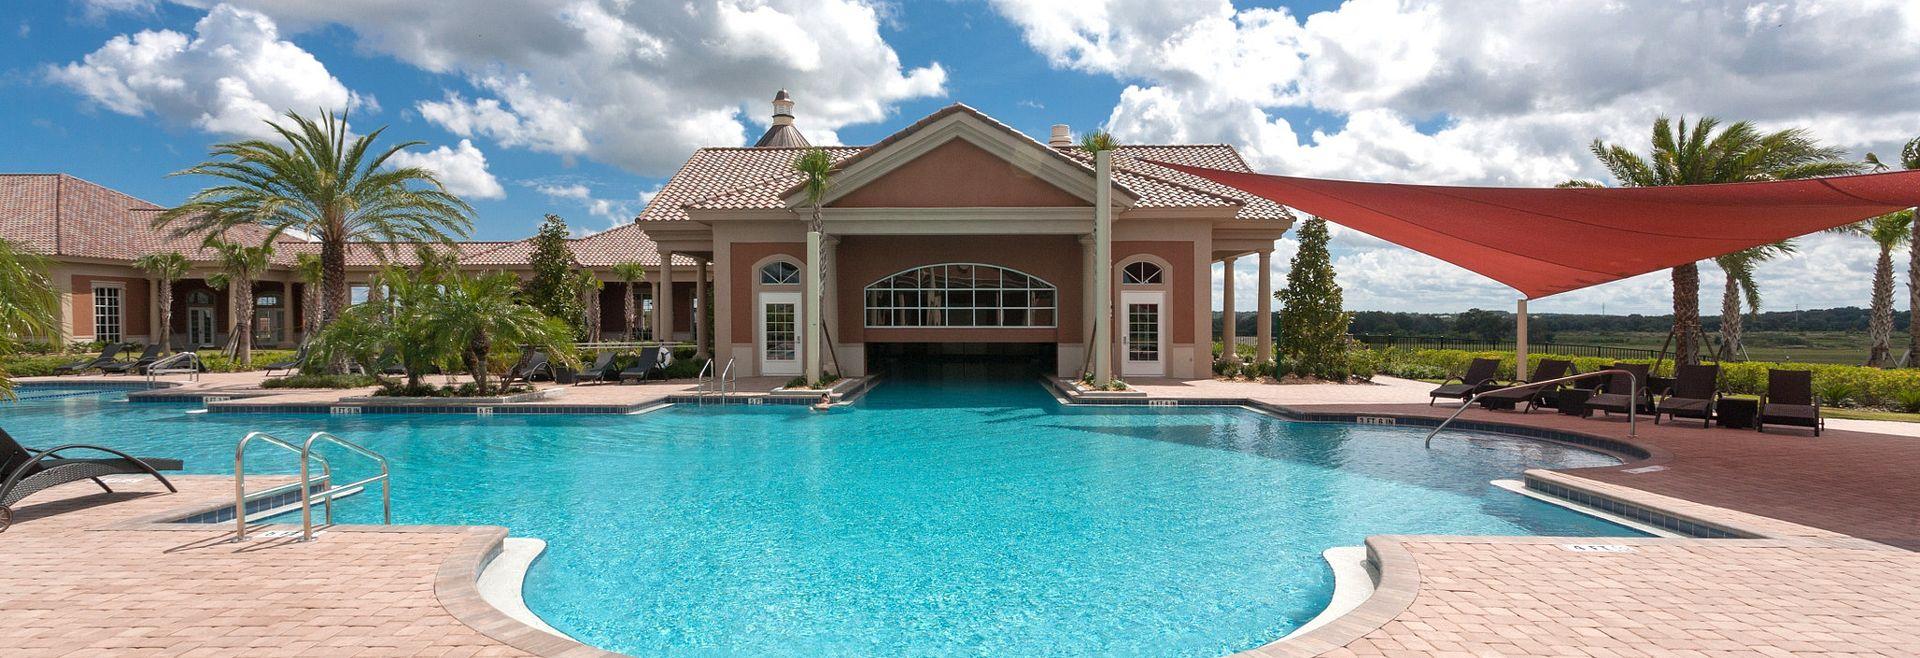 Trilogy Orlando Magnolia House